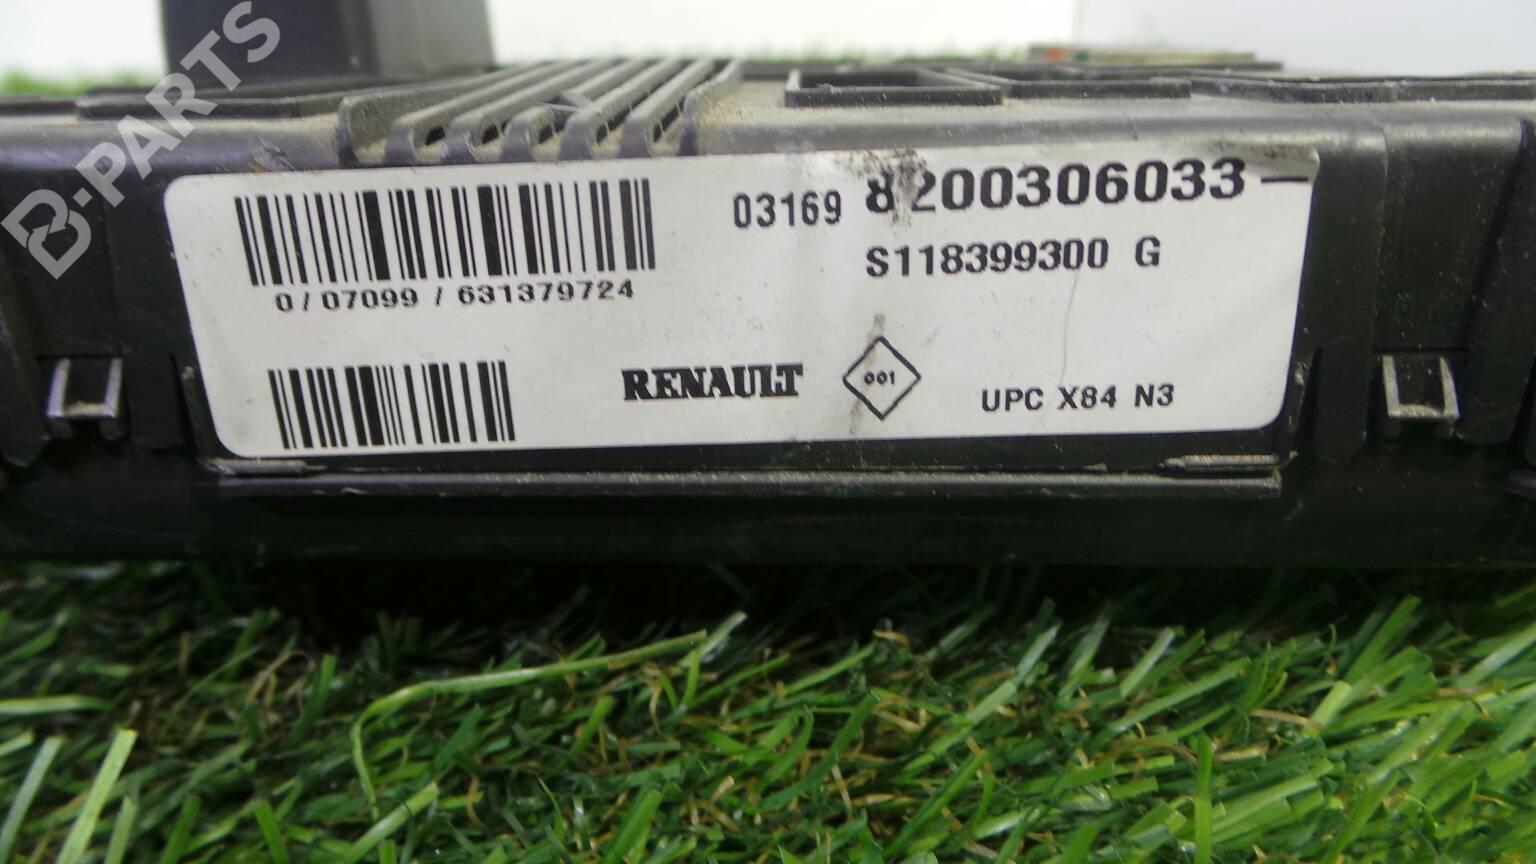 Fuse Box 8200 306 033 RENAULT, MEGANE II (BM0/1_, CM0/